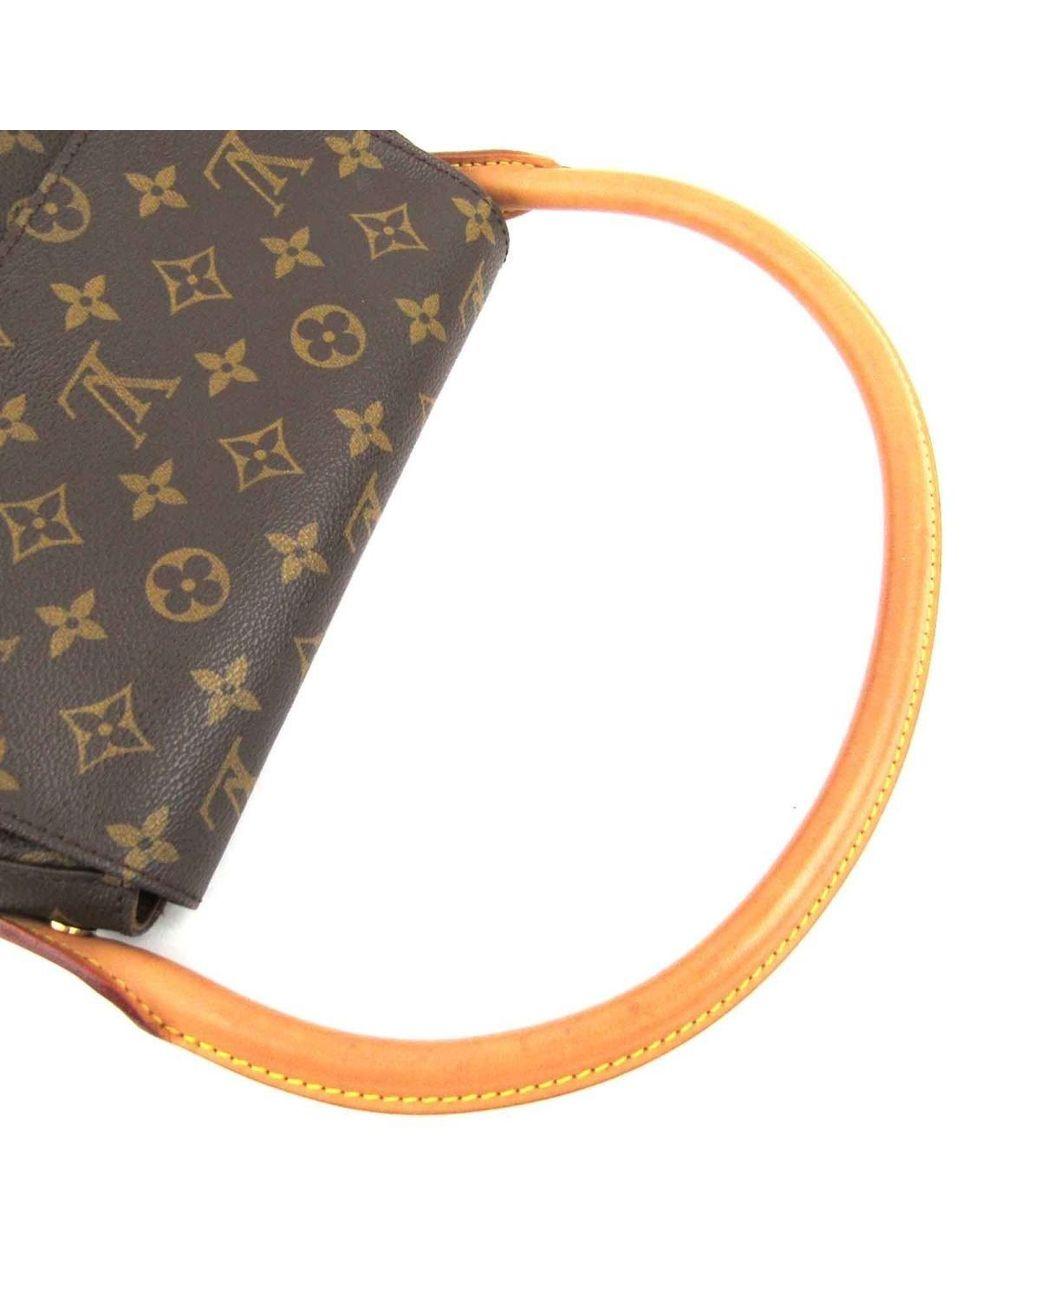 7e15acd11ea82 Louis Vuitton Authentic Mini Looping Flap Shoulder Bag Monogram Canvas  M51147 in Brown - Lyst